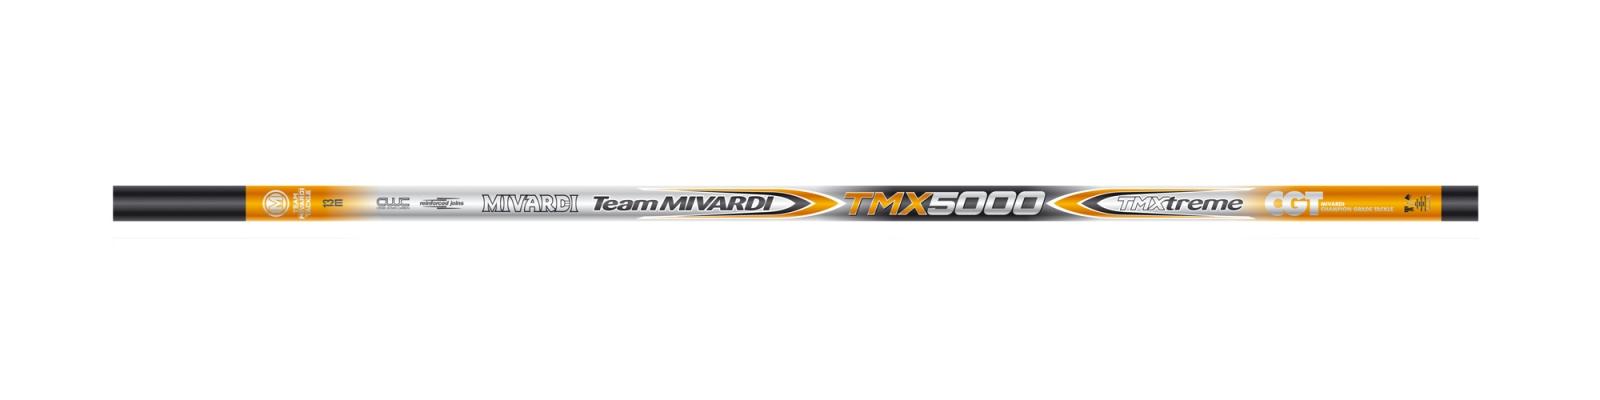 Topset na děličku Team Mivardi TMX 5000   5 dílů